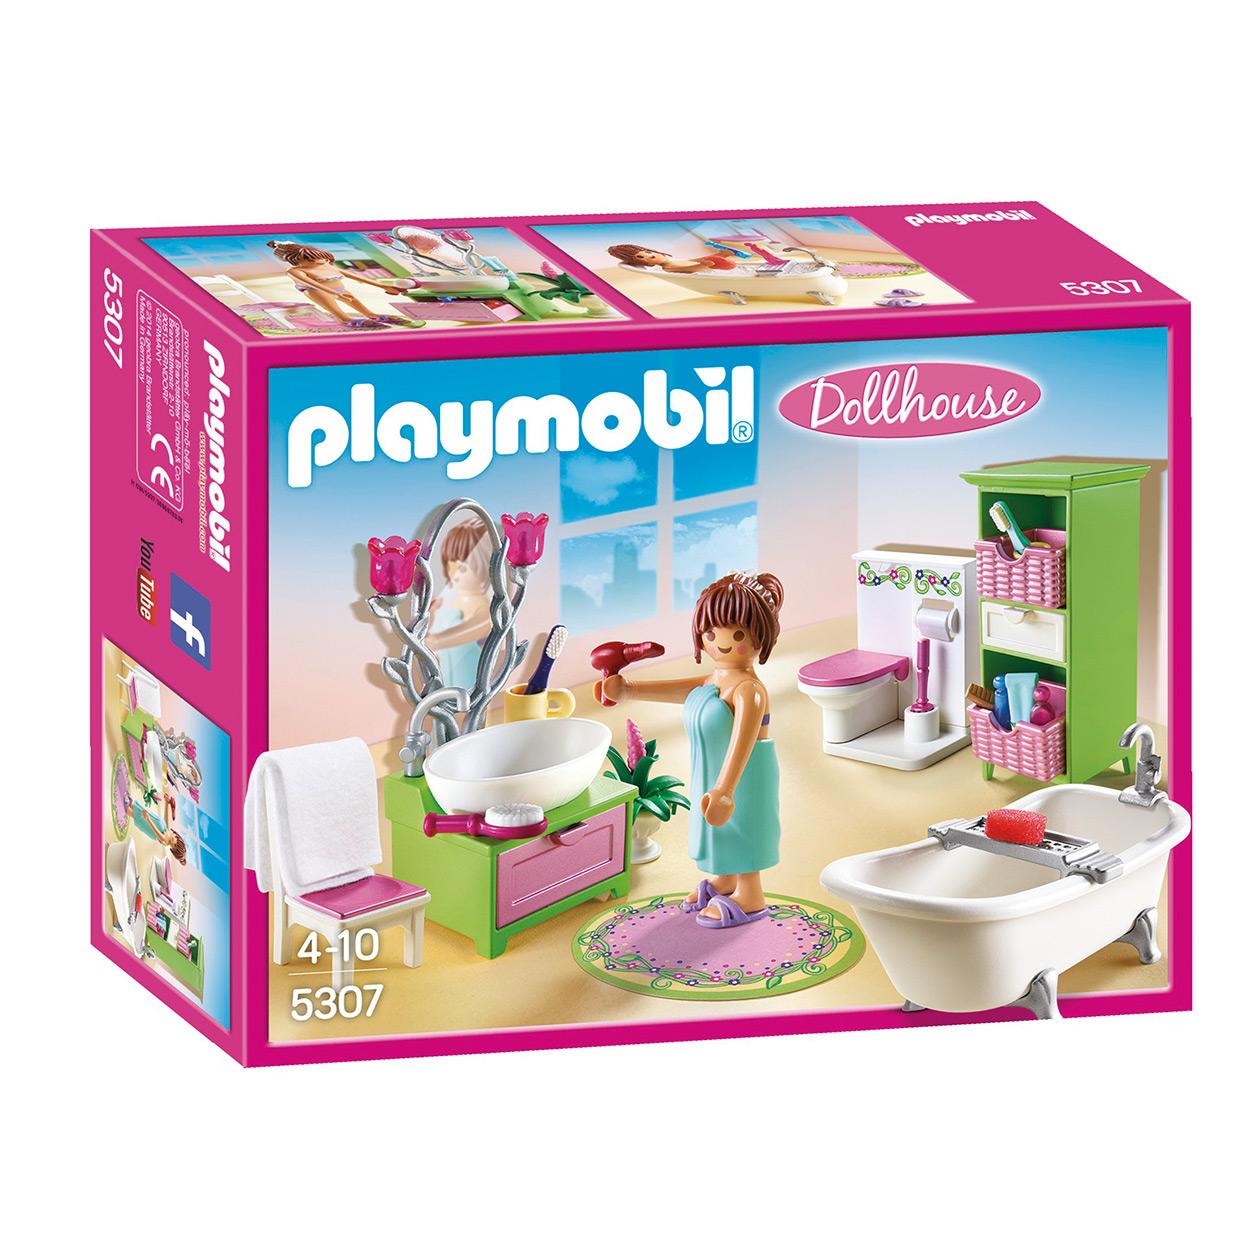 Playmobil 5307 Badkamer met bad op pootjes online kopen | Lobbes.nl